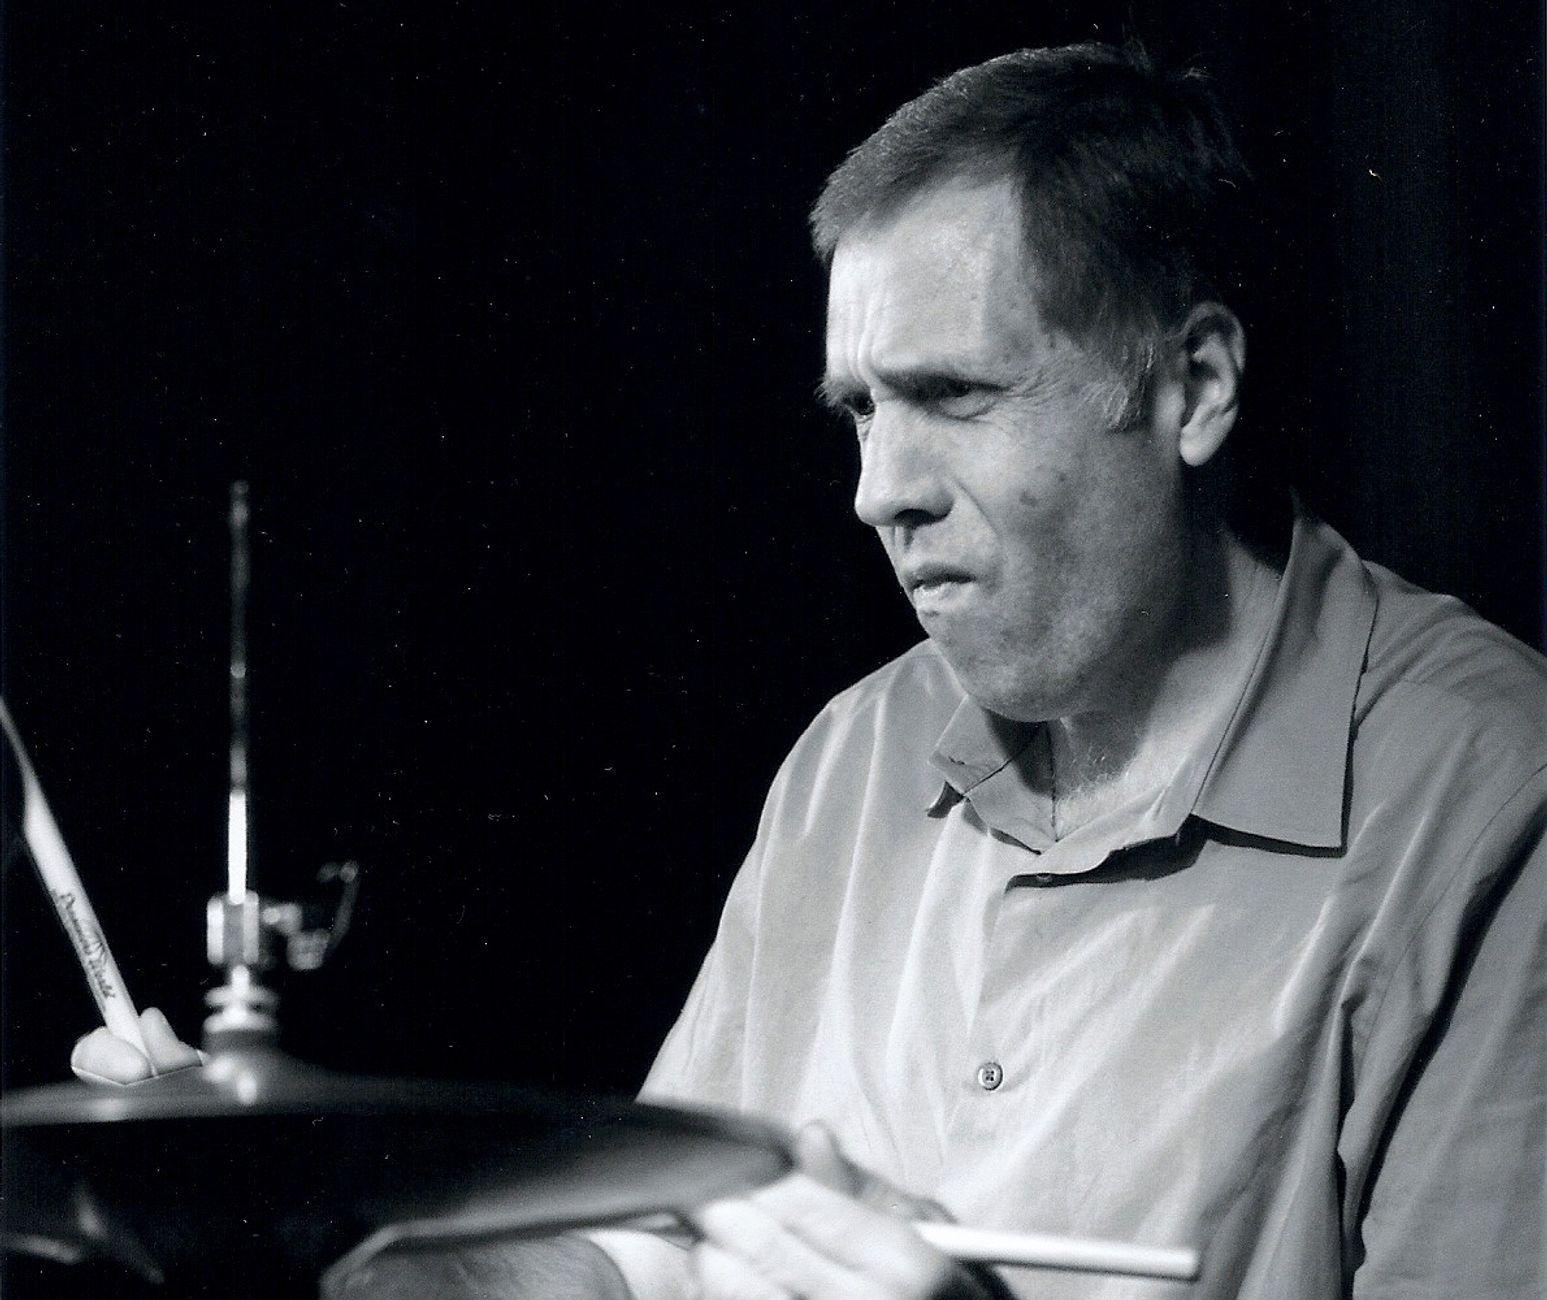 Chuck Redd